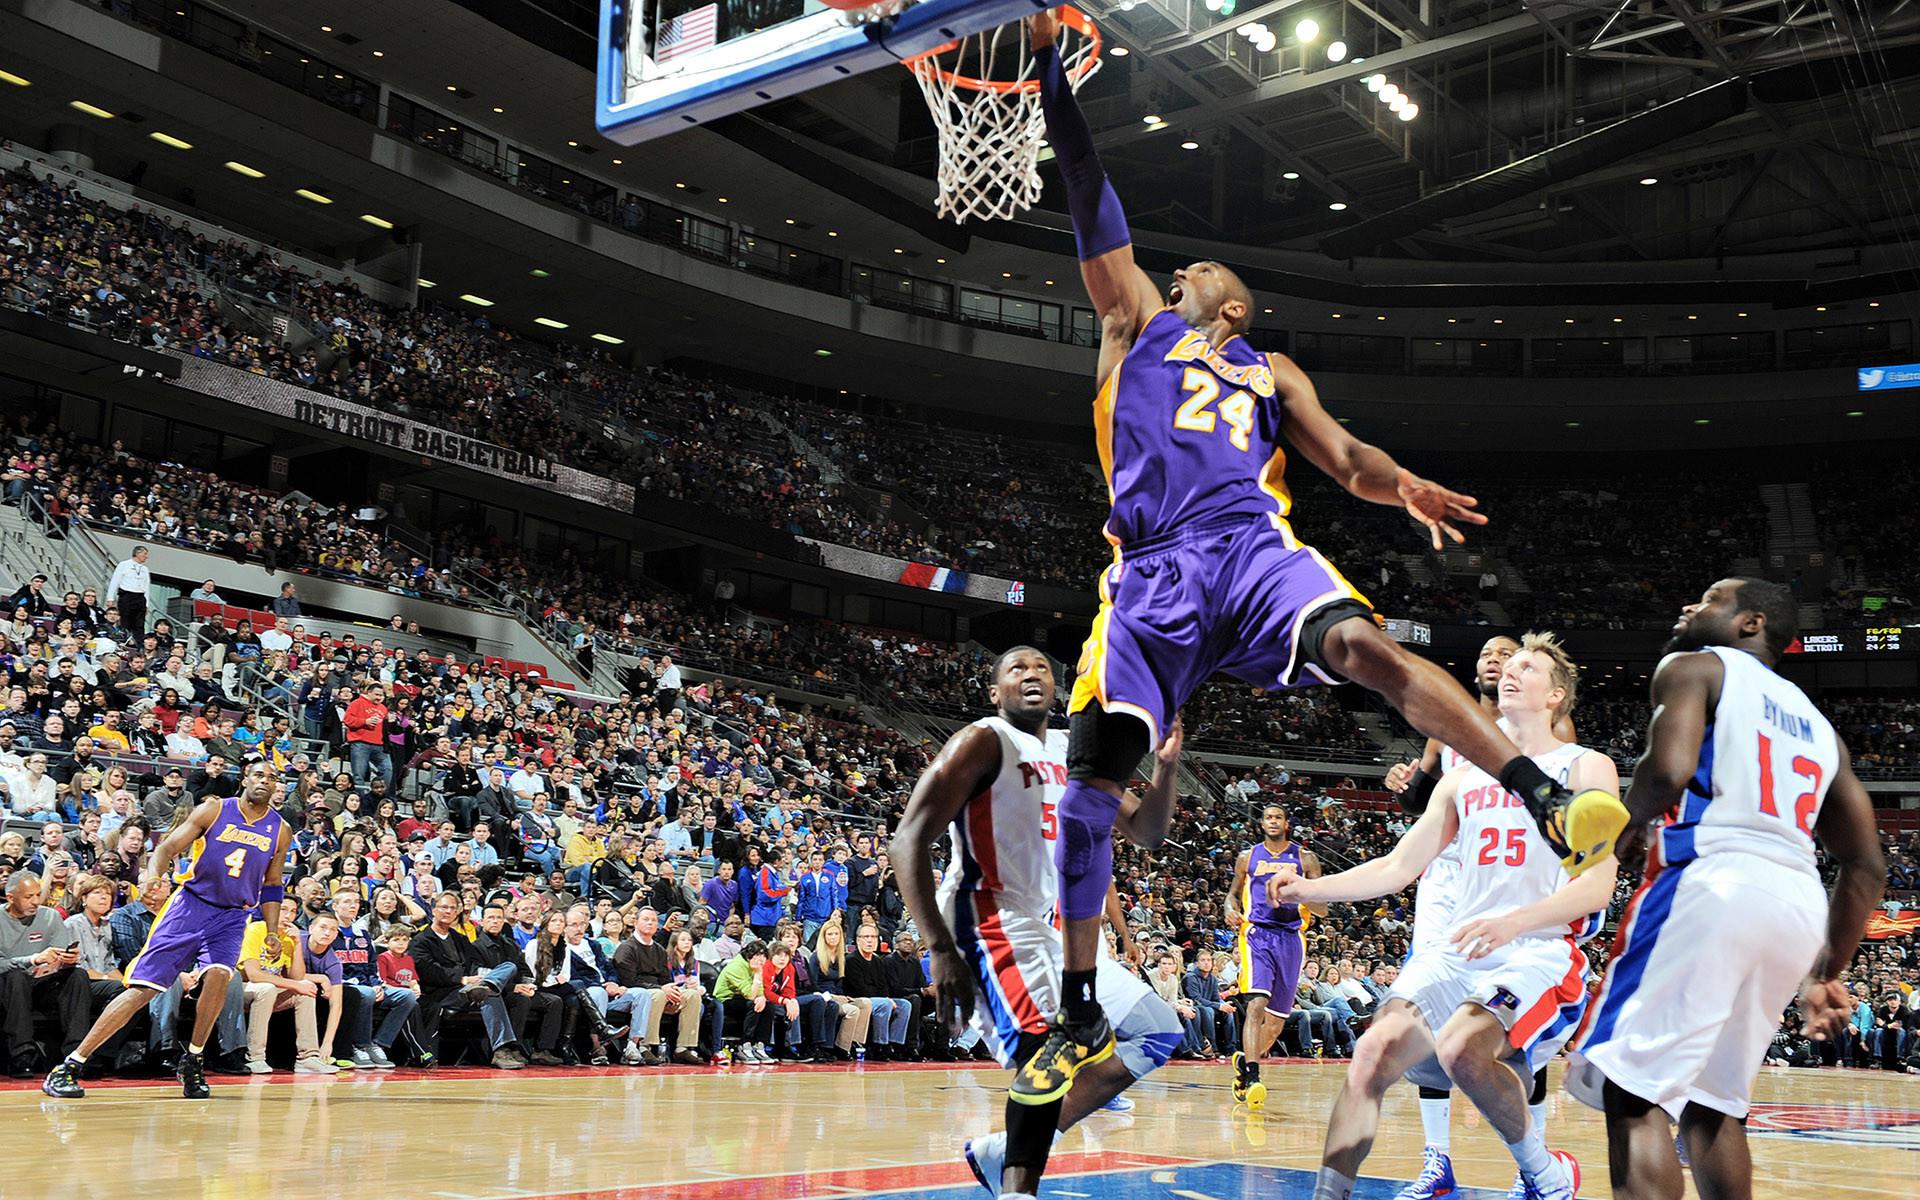 Wallpaper of Kobe Bryant dunk